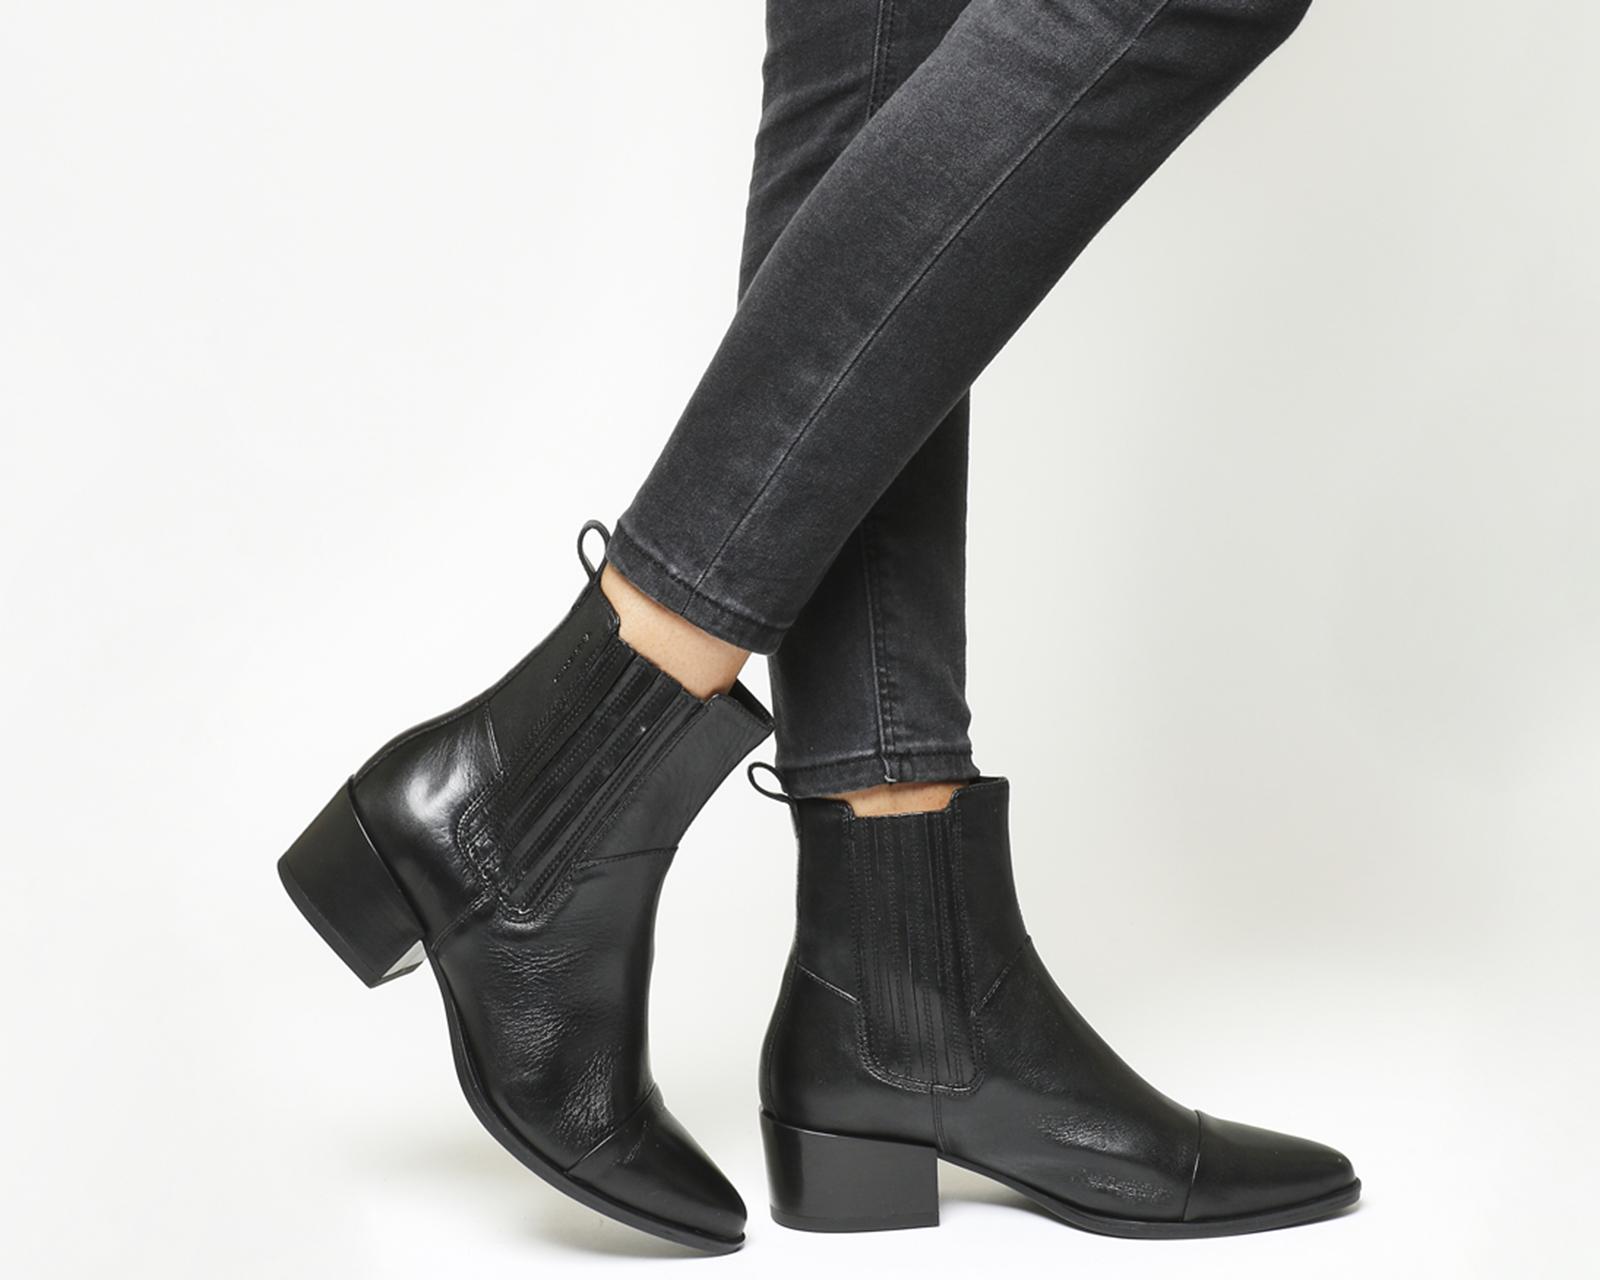 682e6c92643 Sentinel Womens Vagabond Marja Chelsea Boots Black Leather Boots